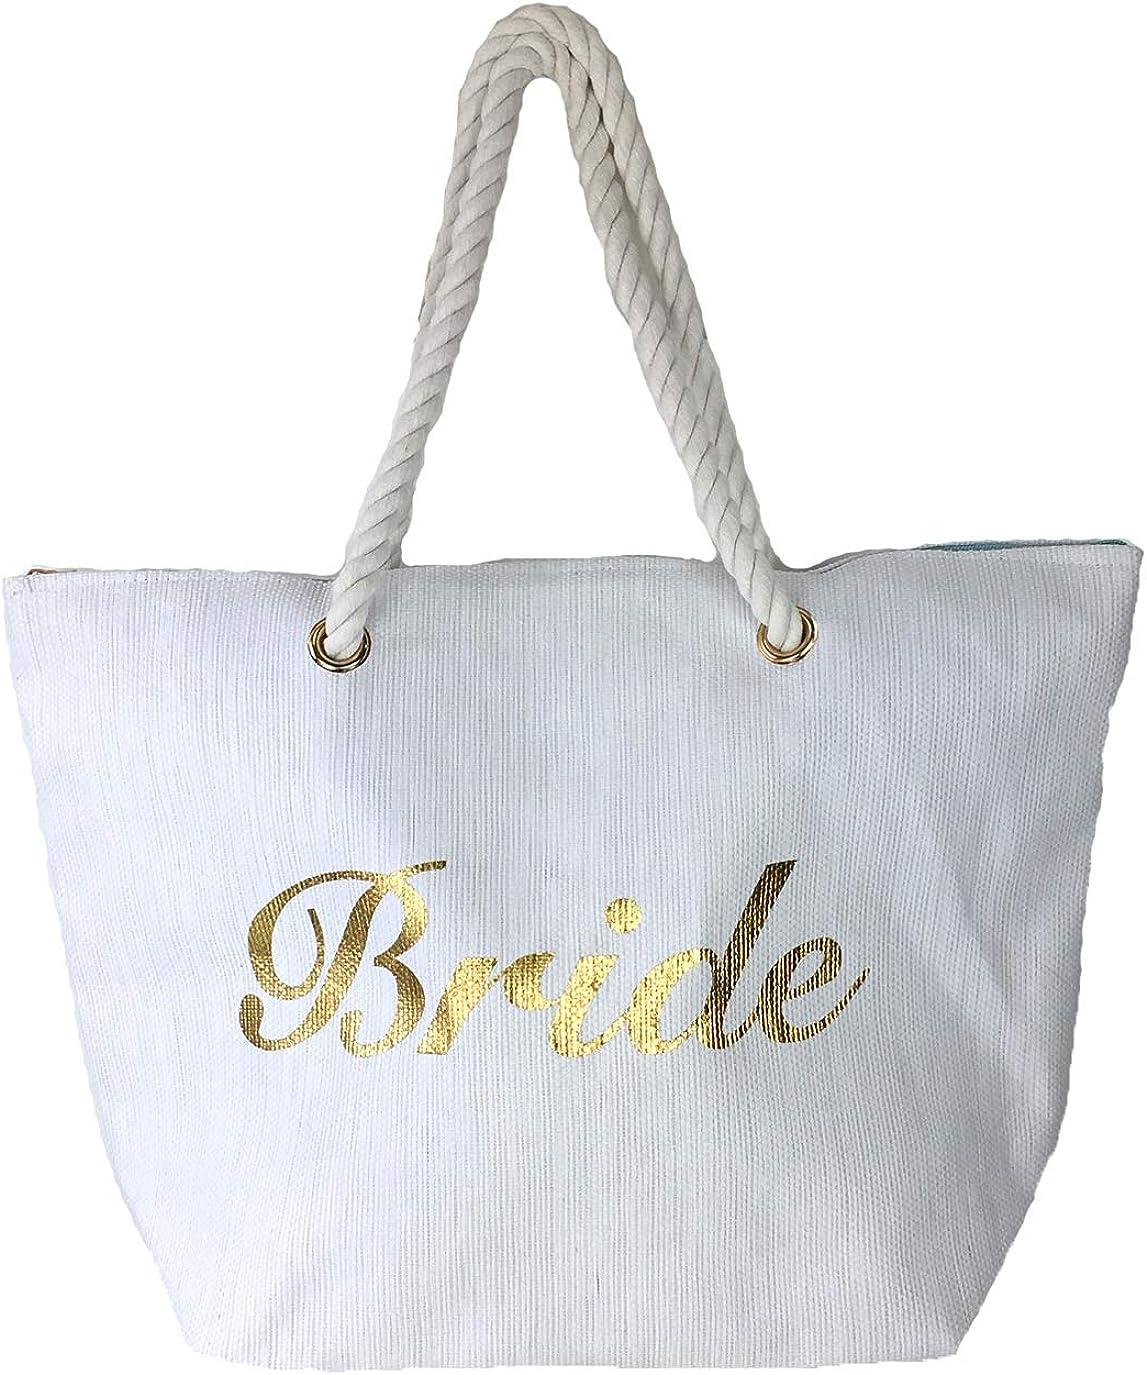 Magid Bride Beach Bag Packable Large Tote White